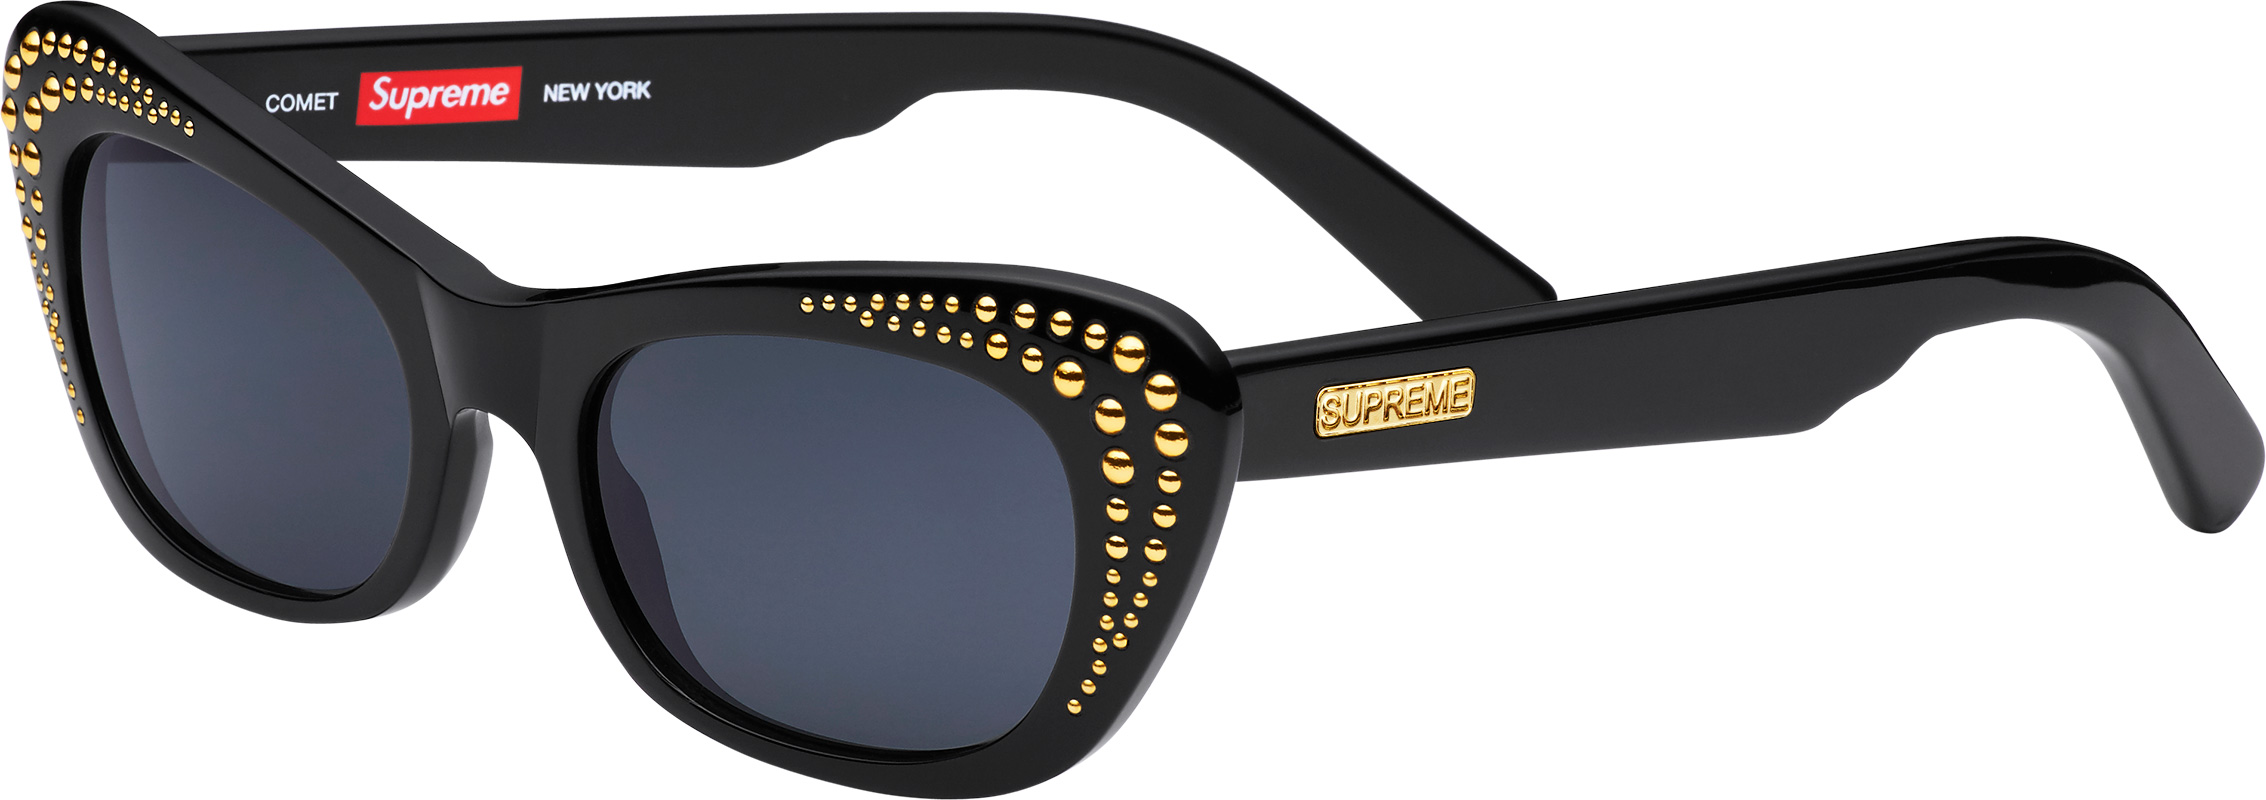 supreme